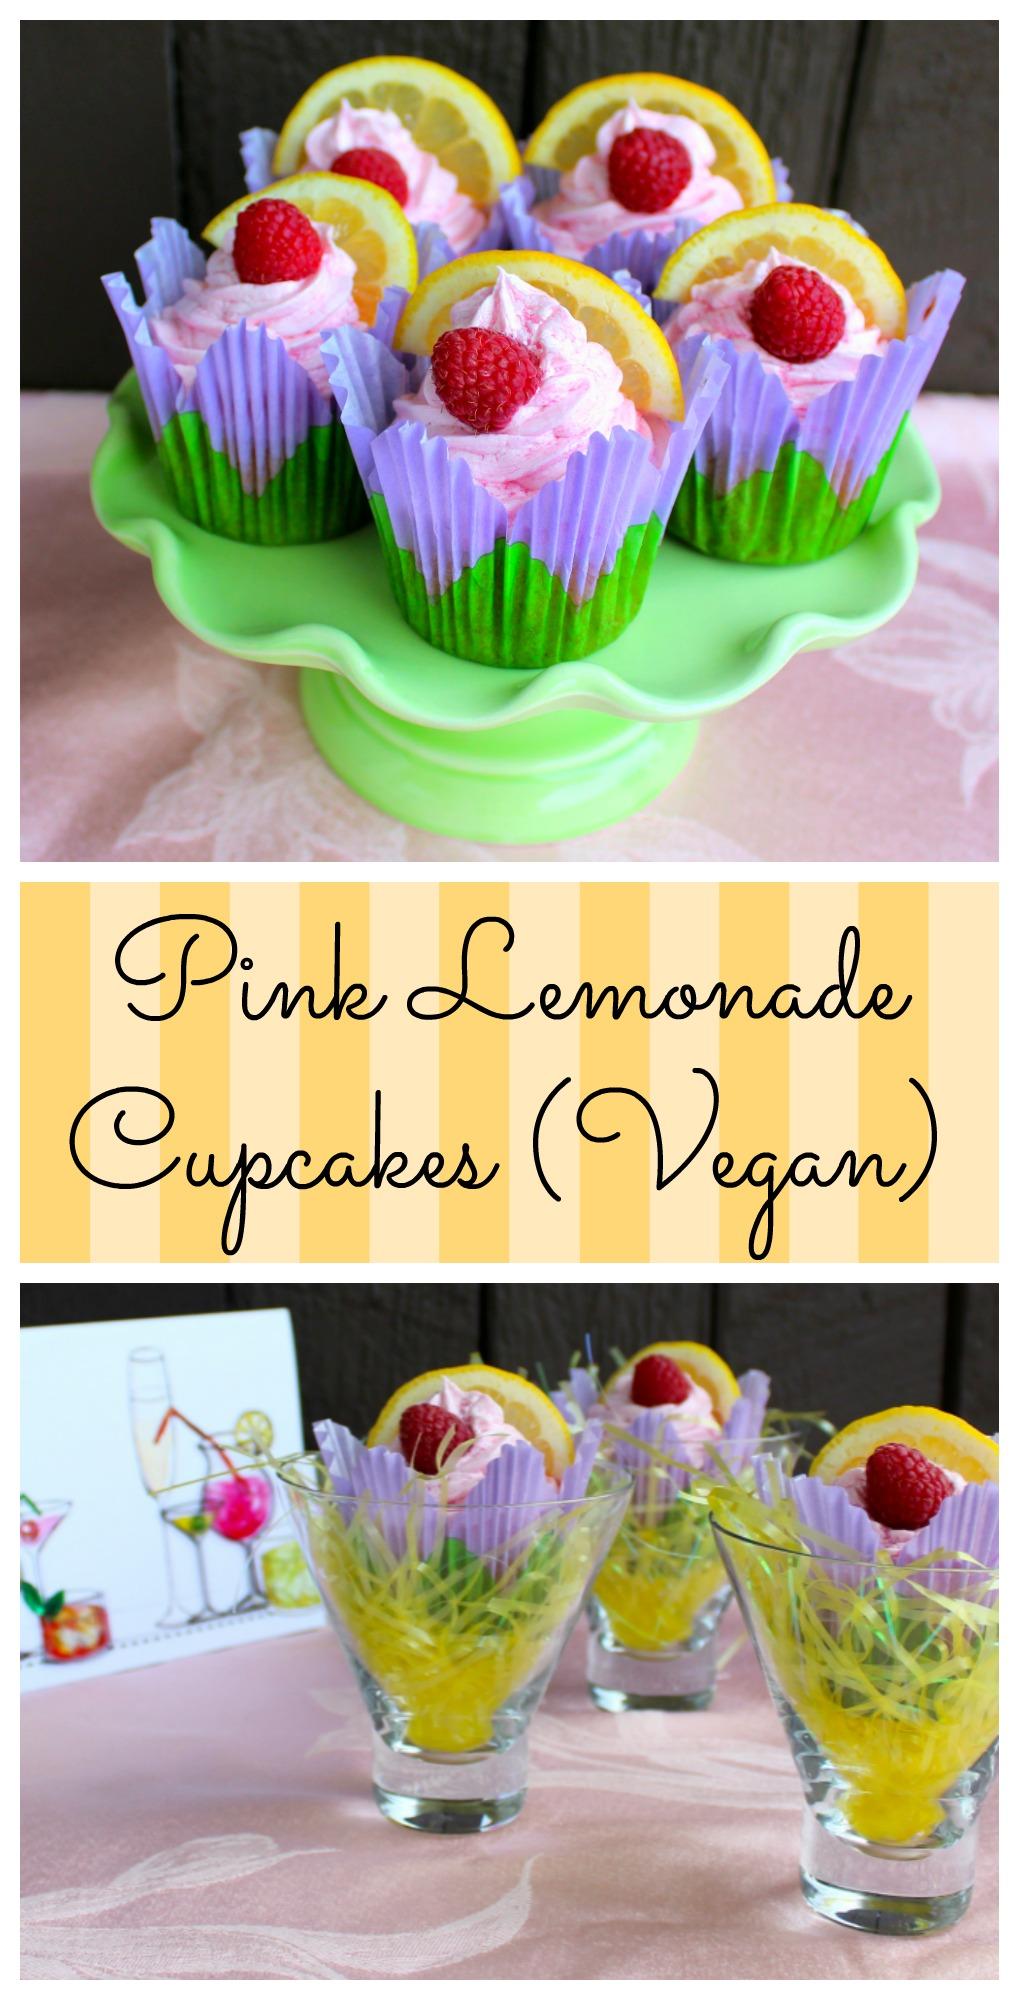 Pink Lemonday Cupcakes (Vegan).jpg